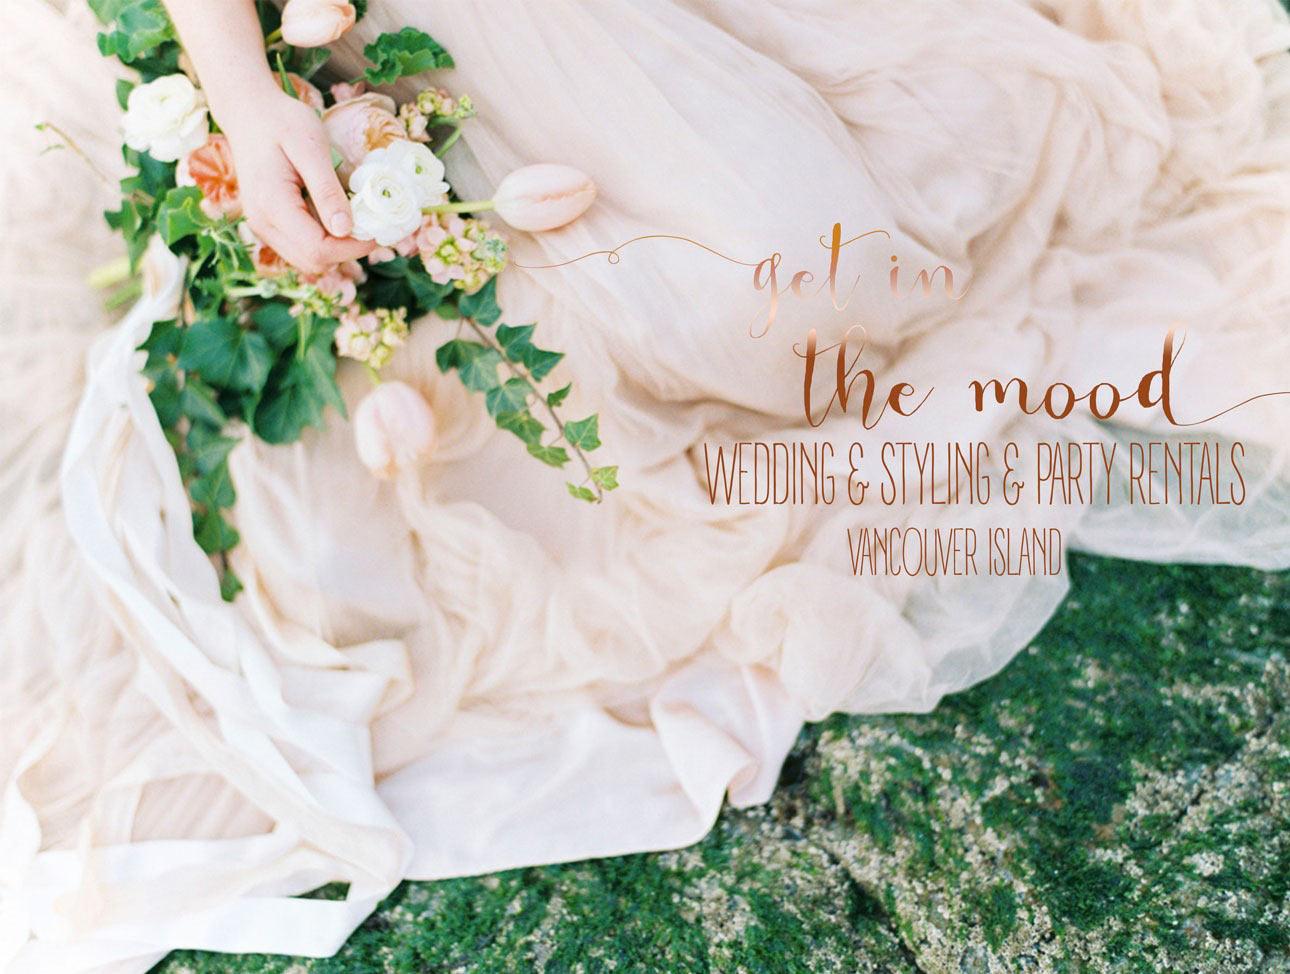 header image of bride to represent wedding planning company